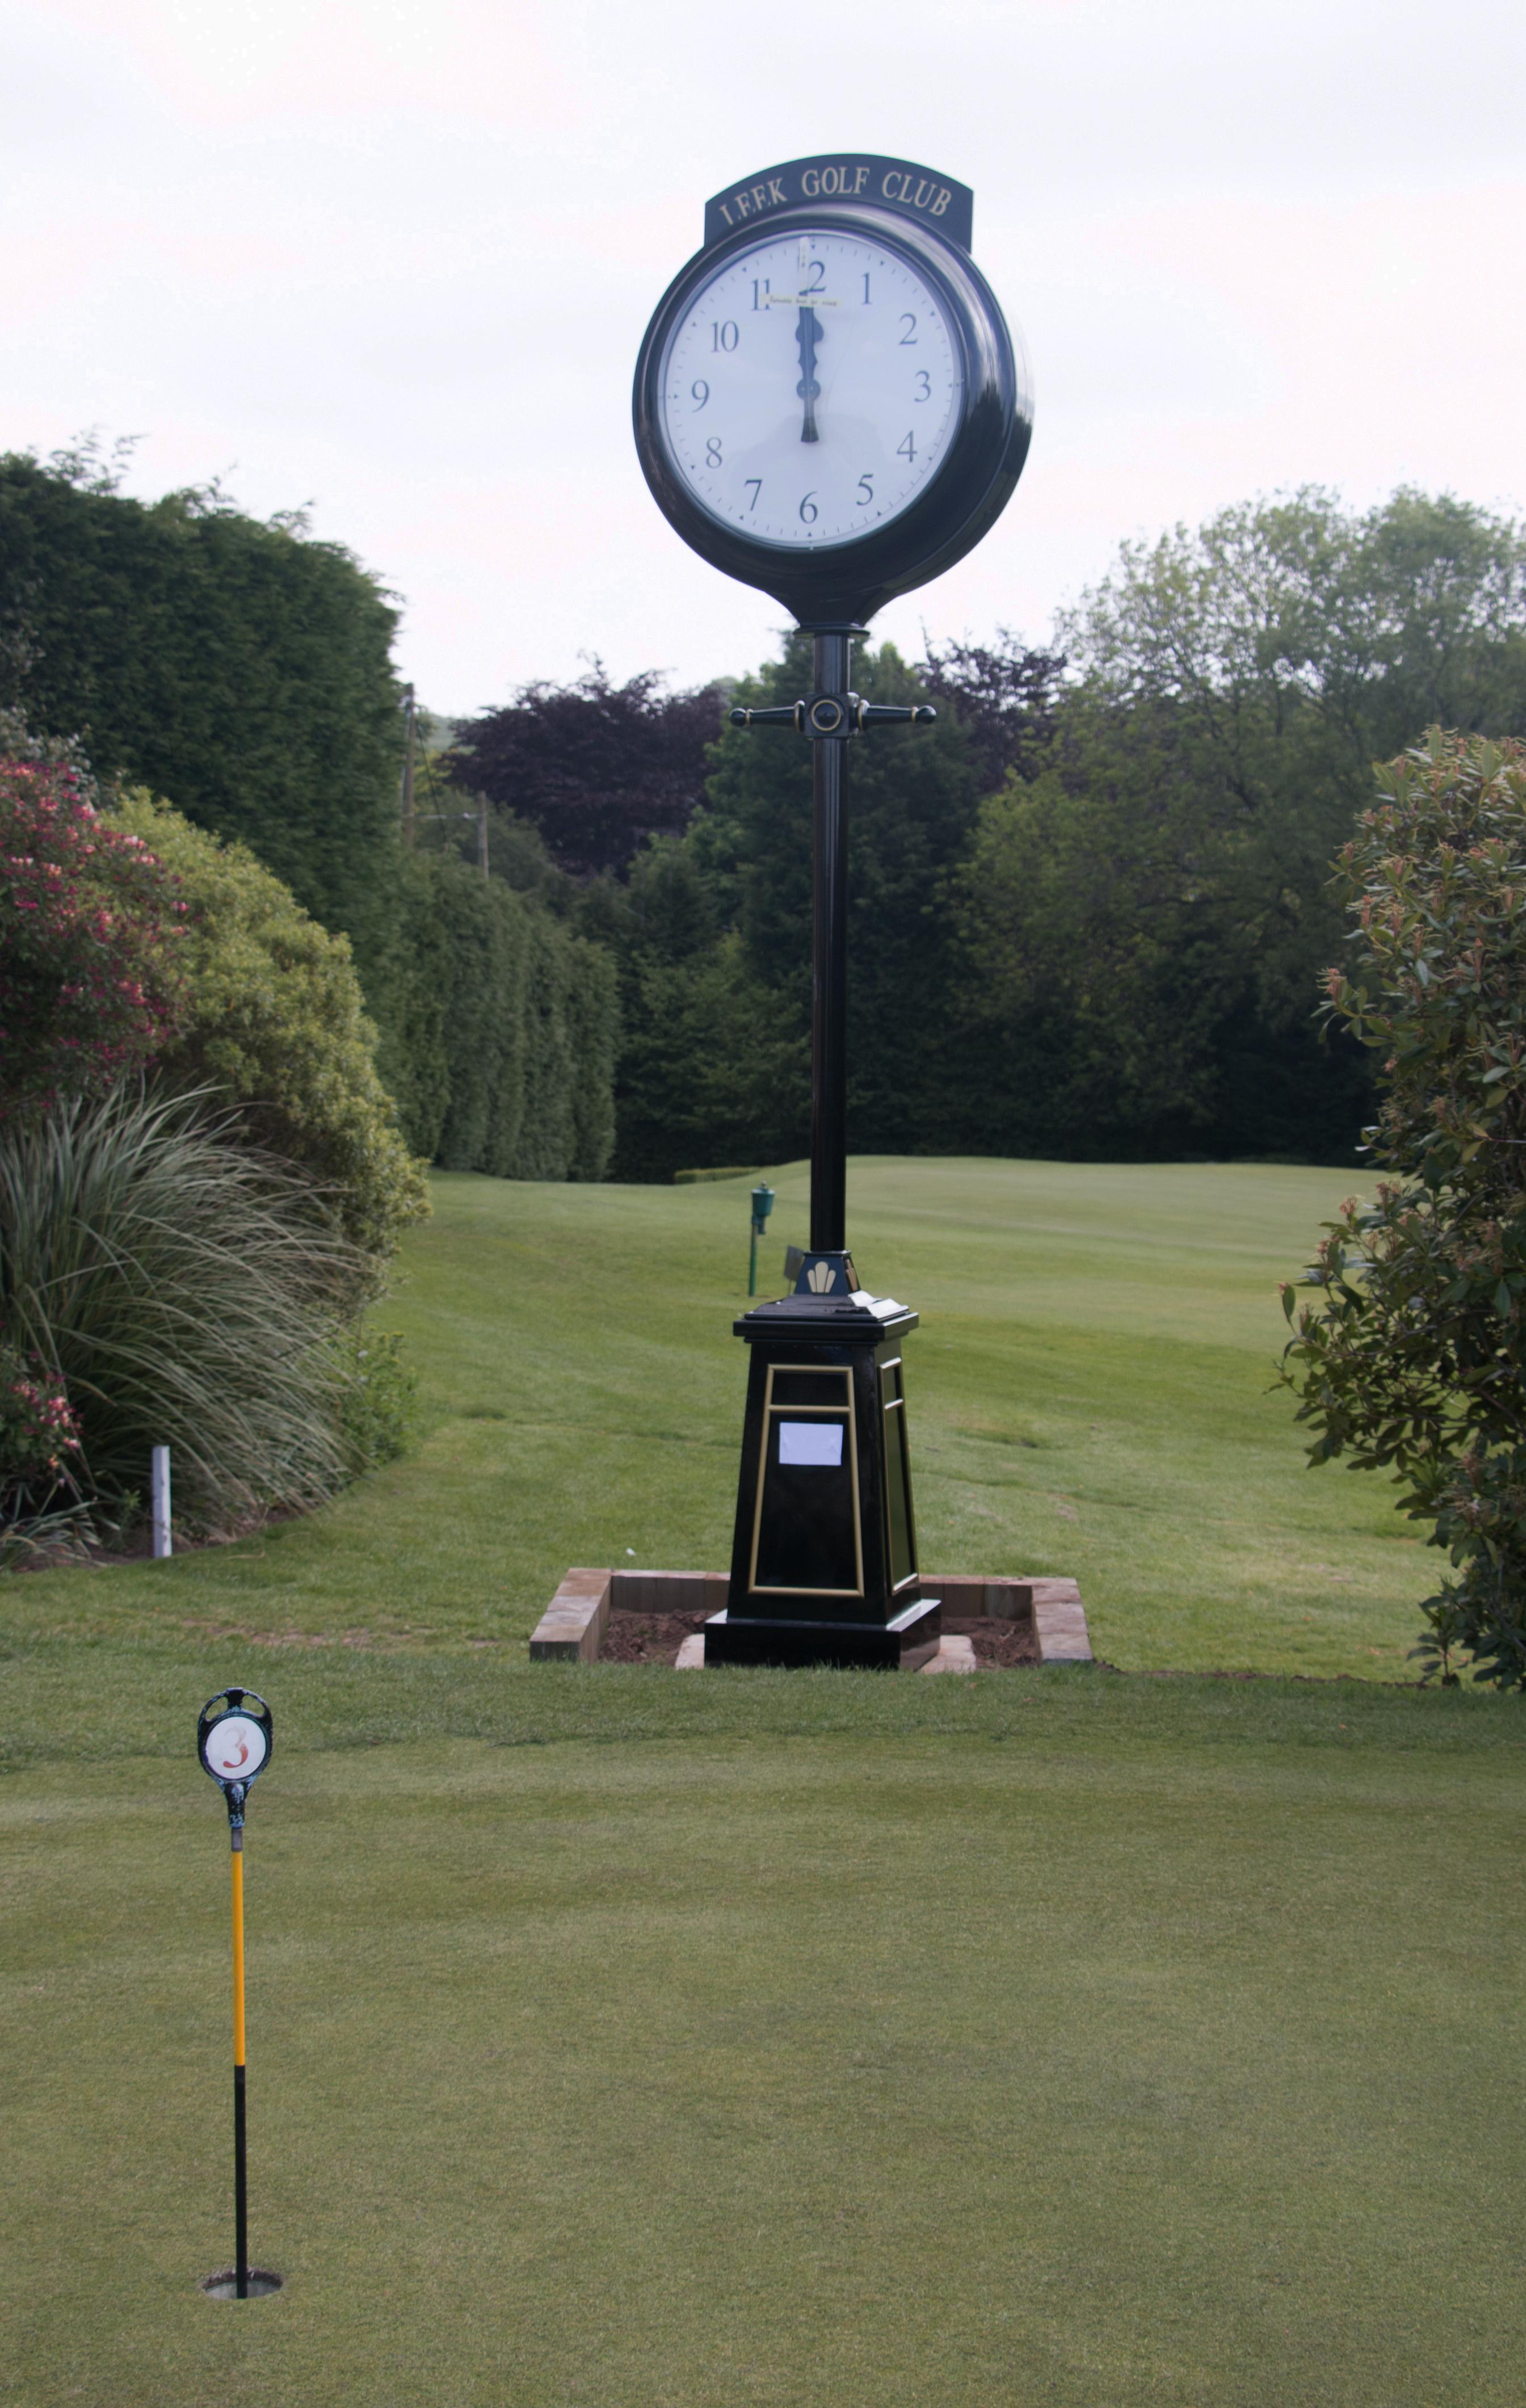 Pillar clock in place